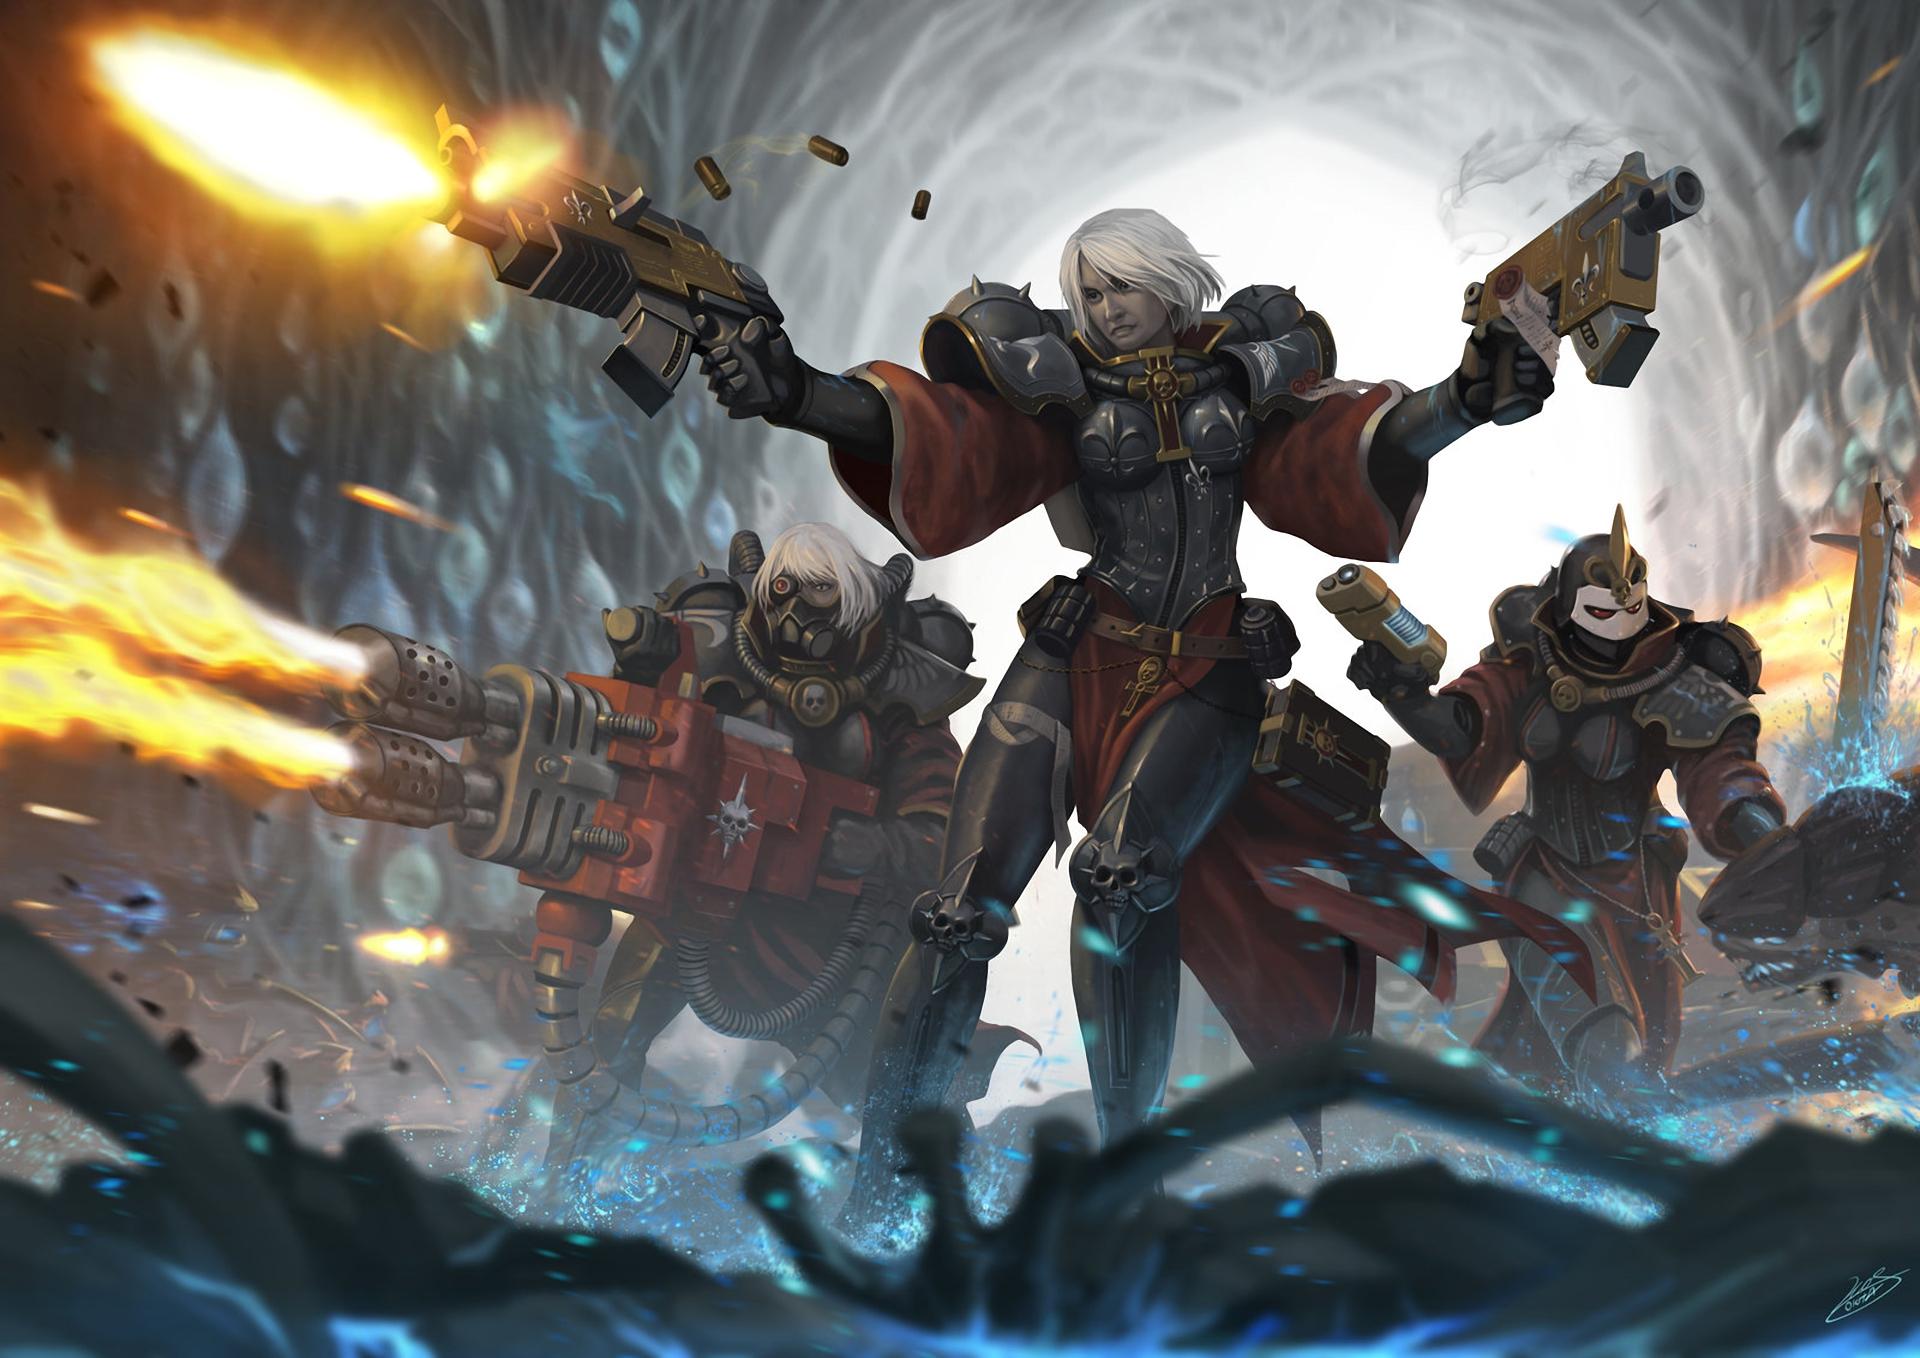 Warhammer HD Wallpaper | Background Image | 1920x1358 | ID ...